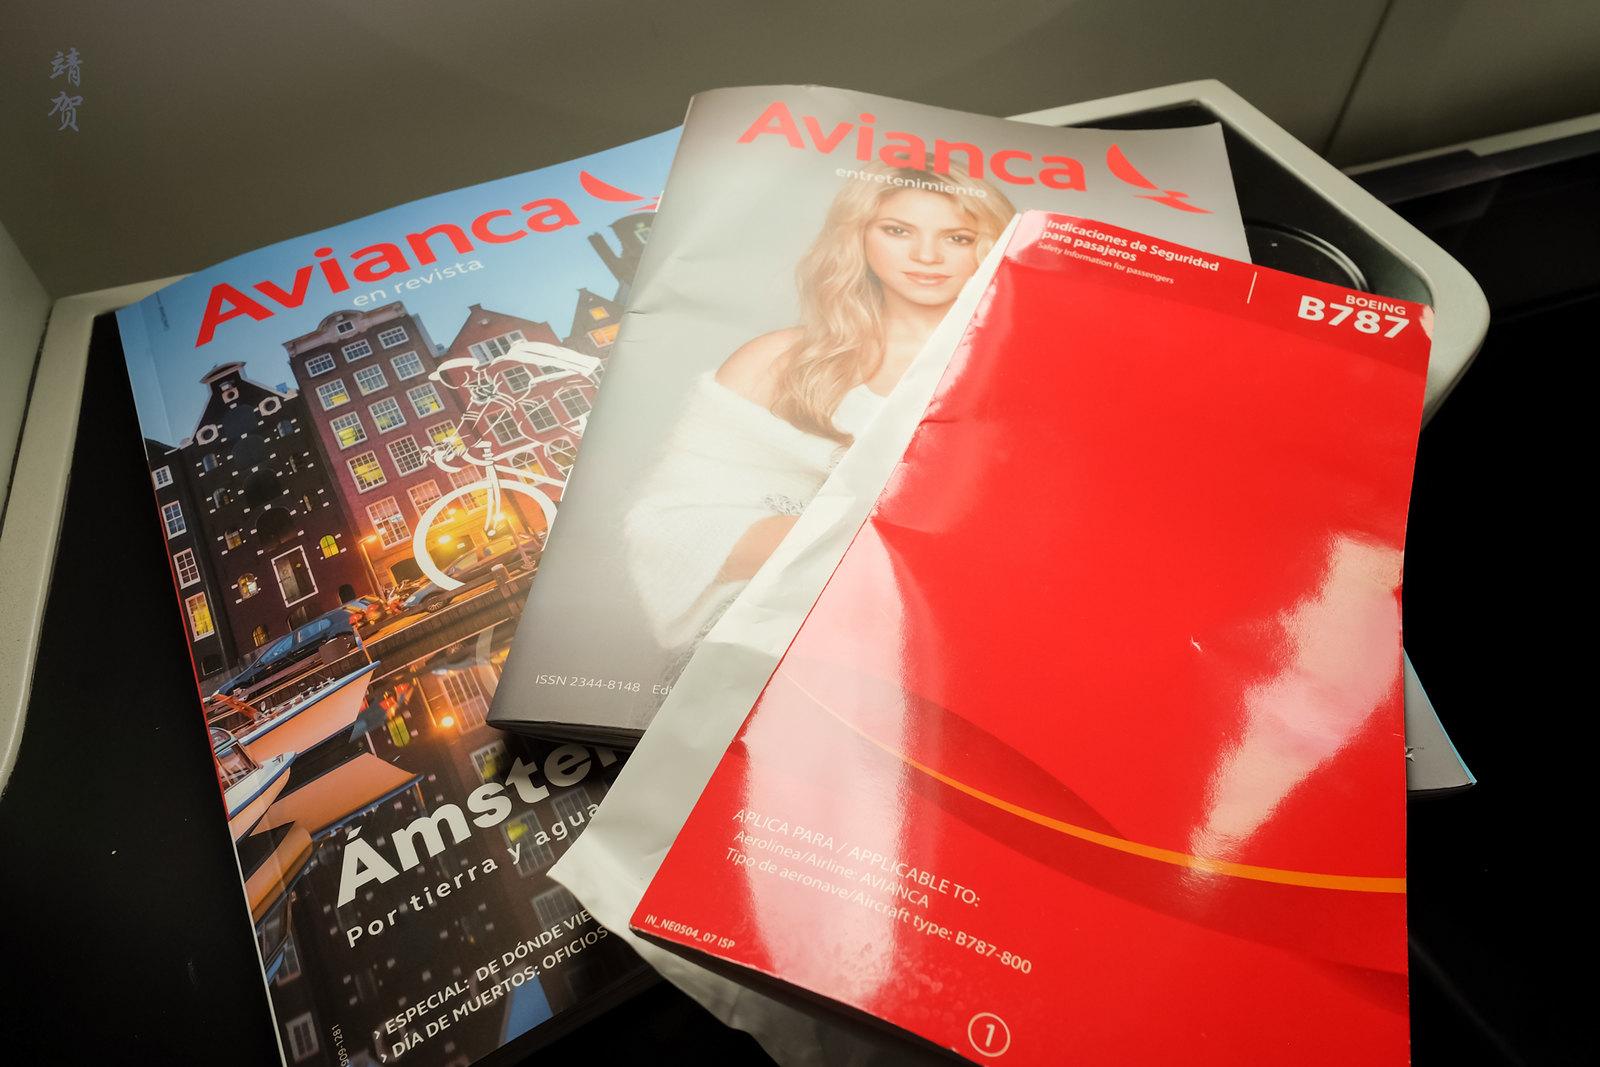 Inflight magazines